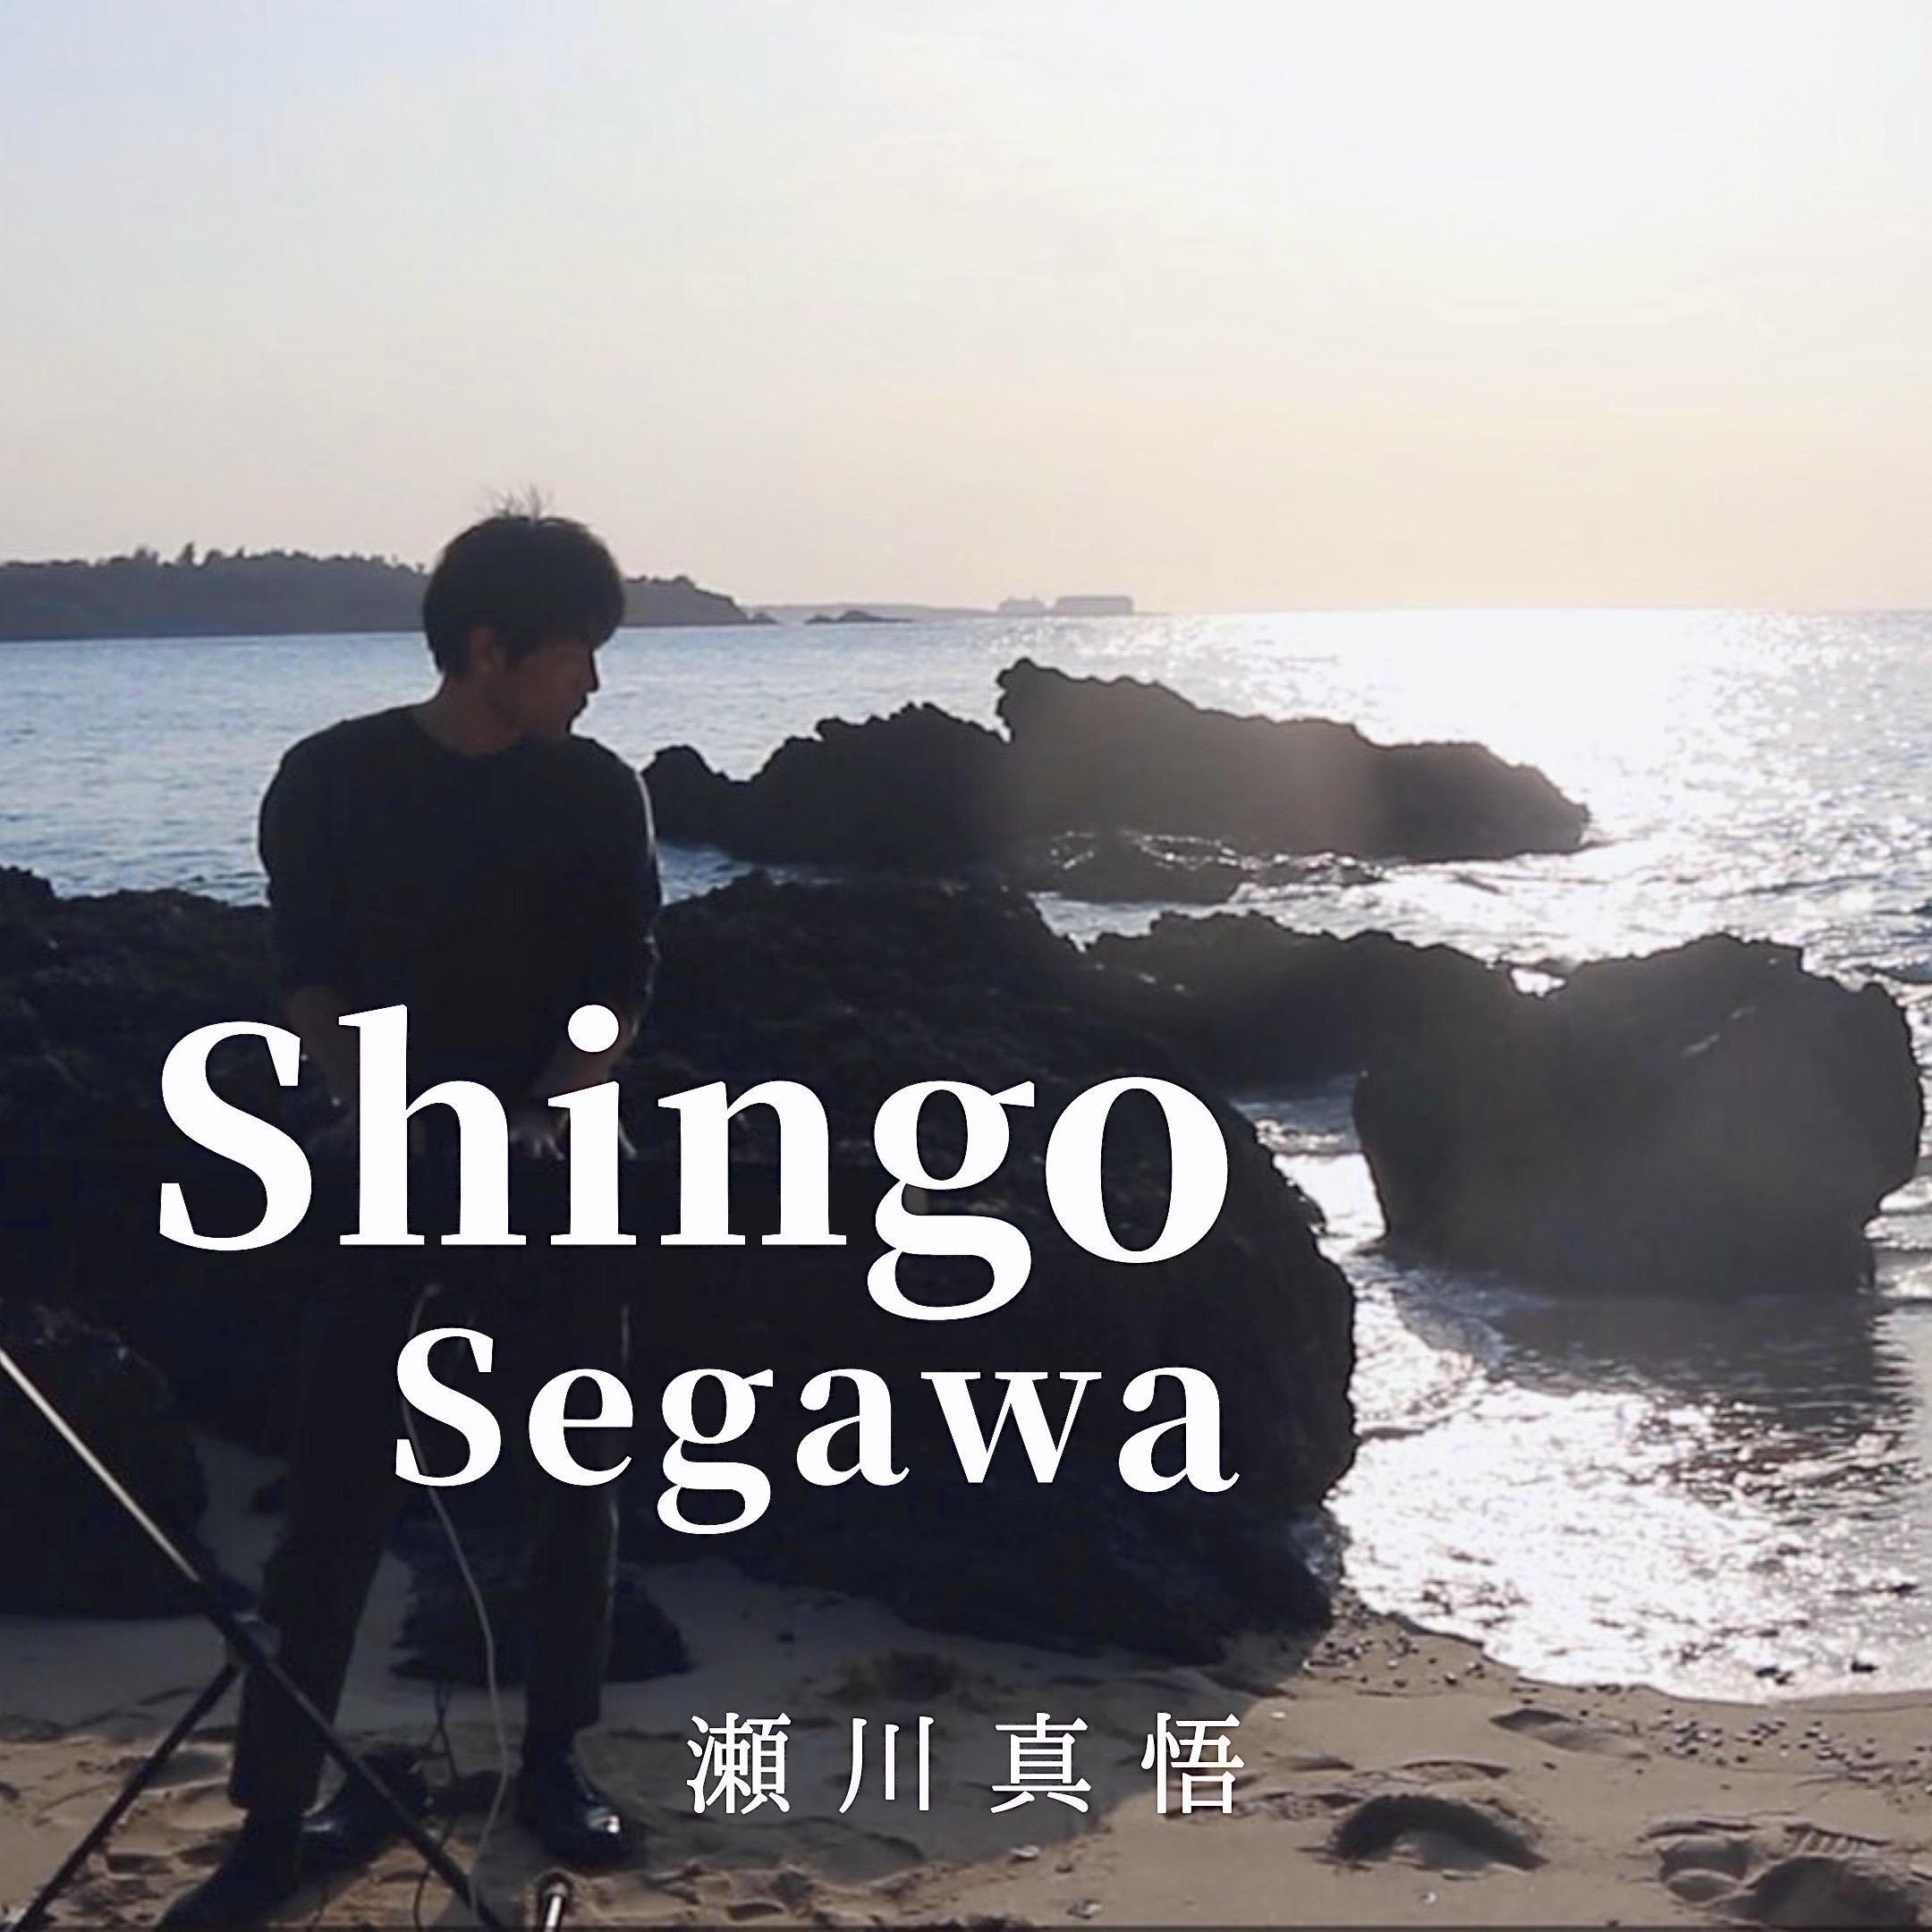 Shingo Segawa 瀬川真悟 ピアノレッスン HOMEPAGE